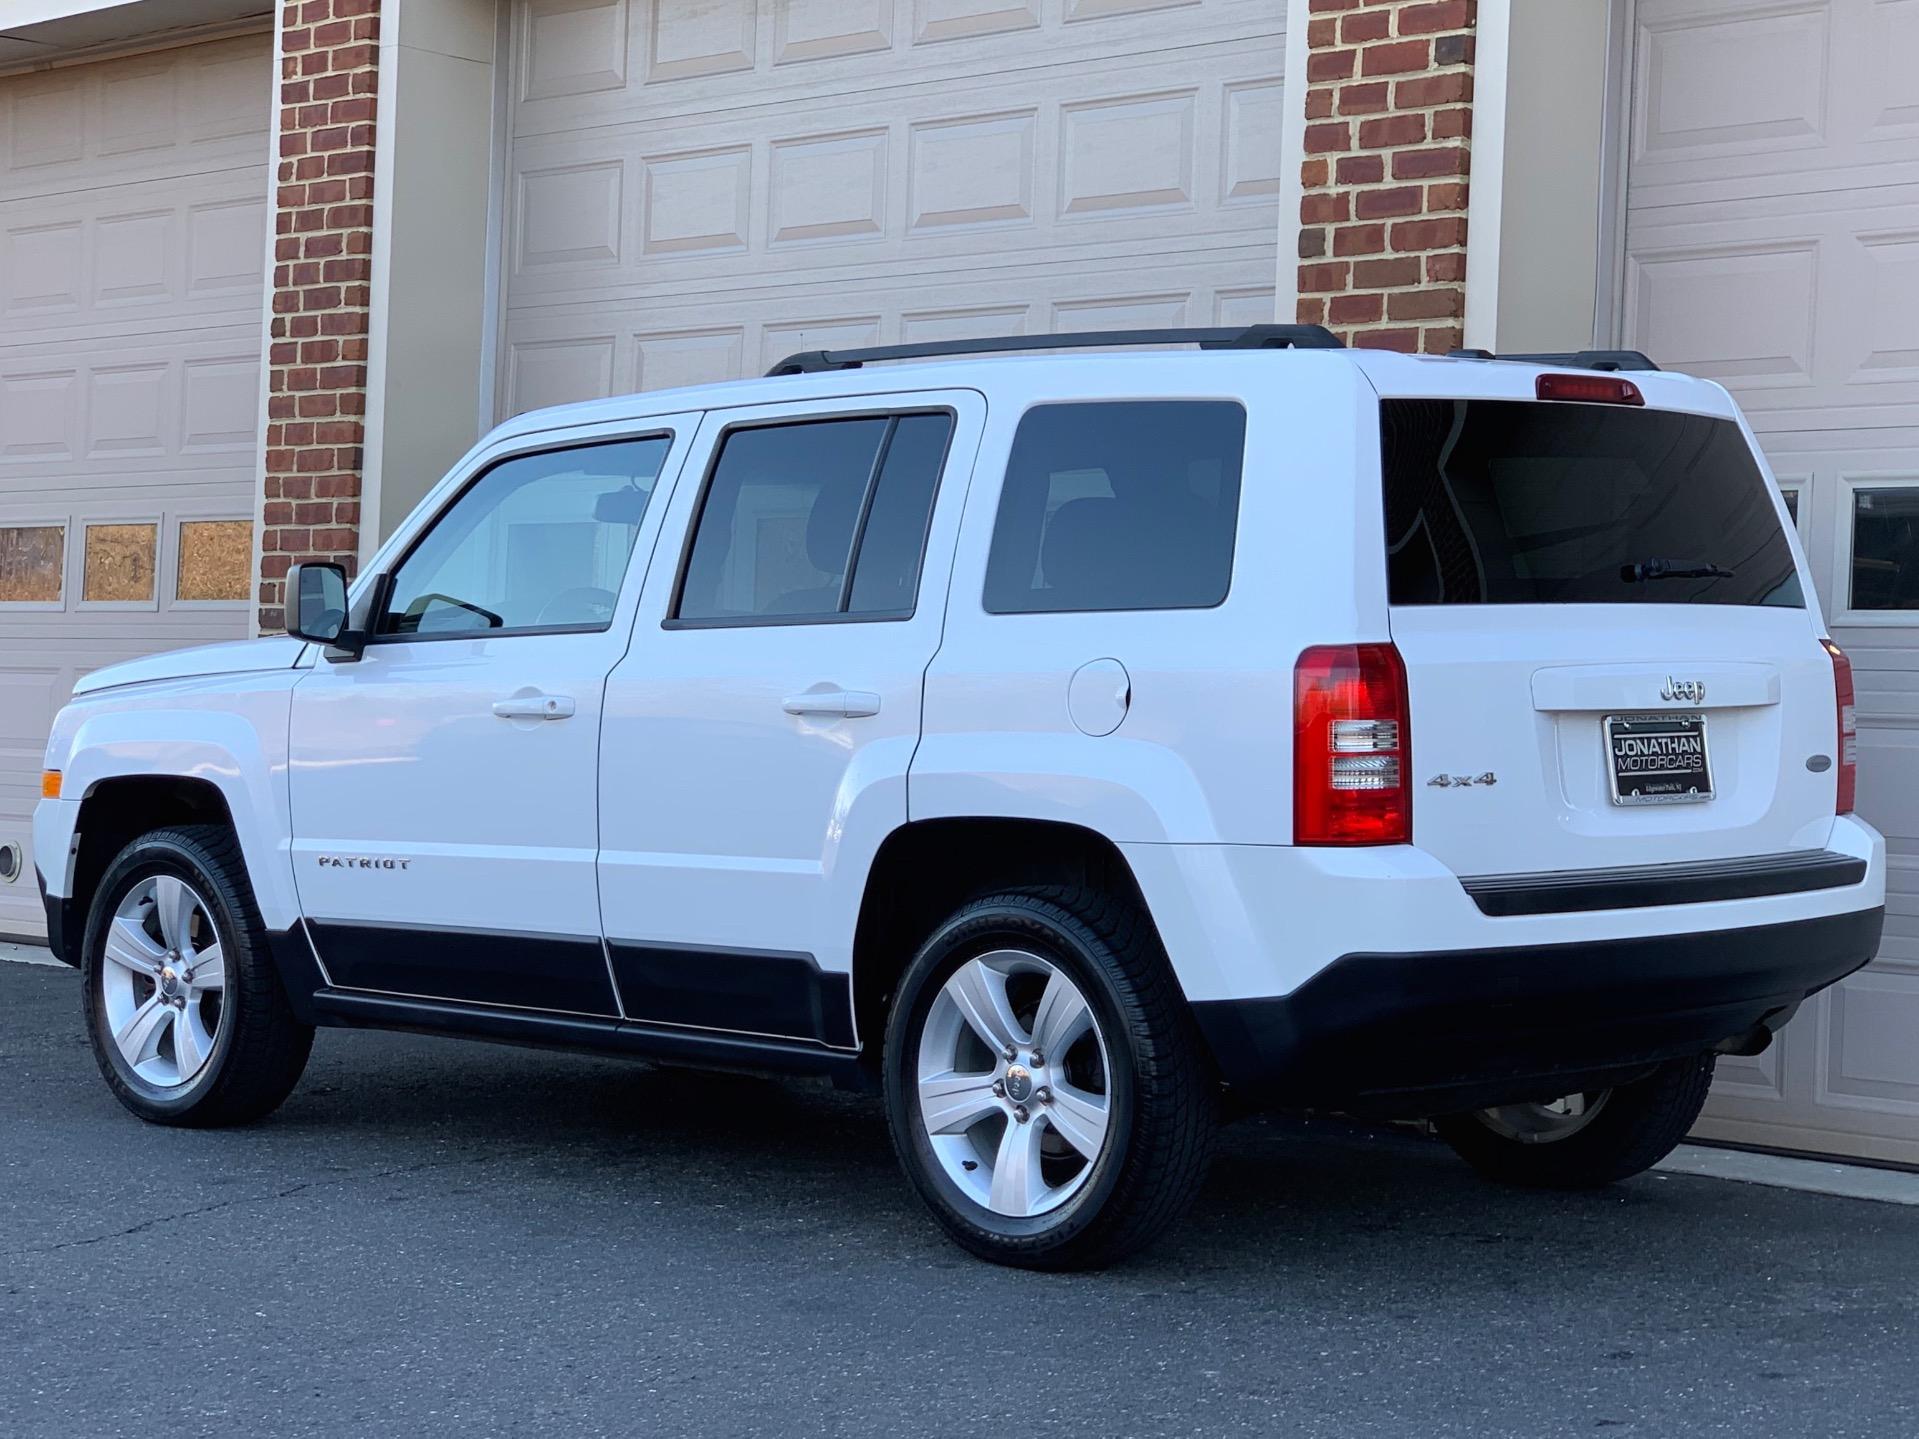 Used-2014-Jeep-Patriot-Latitude